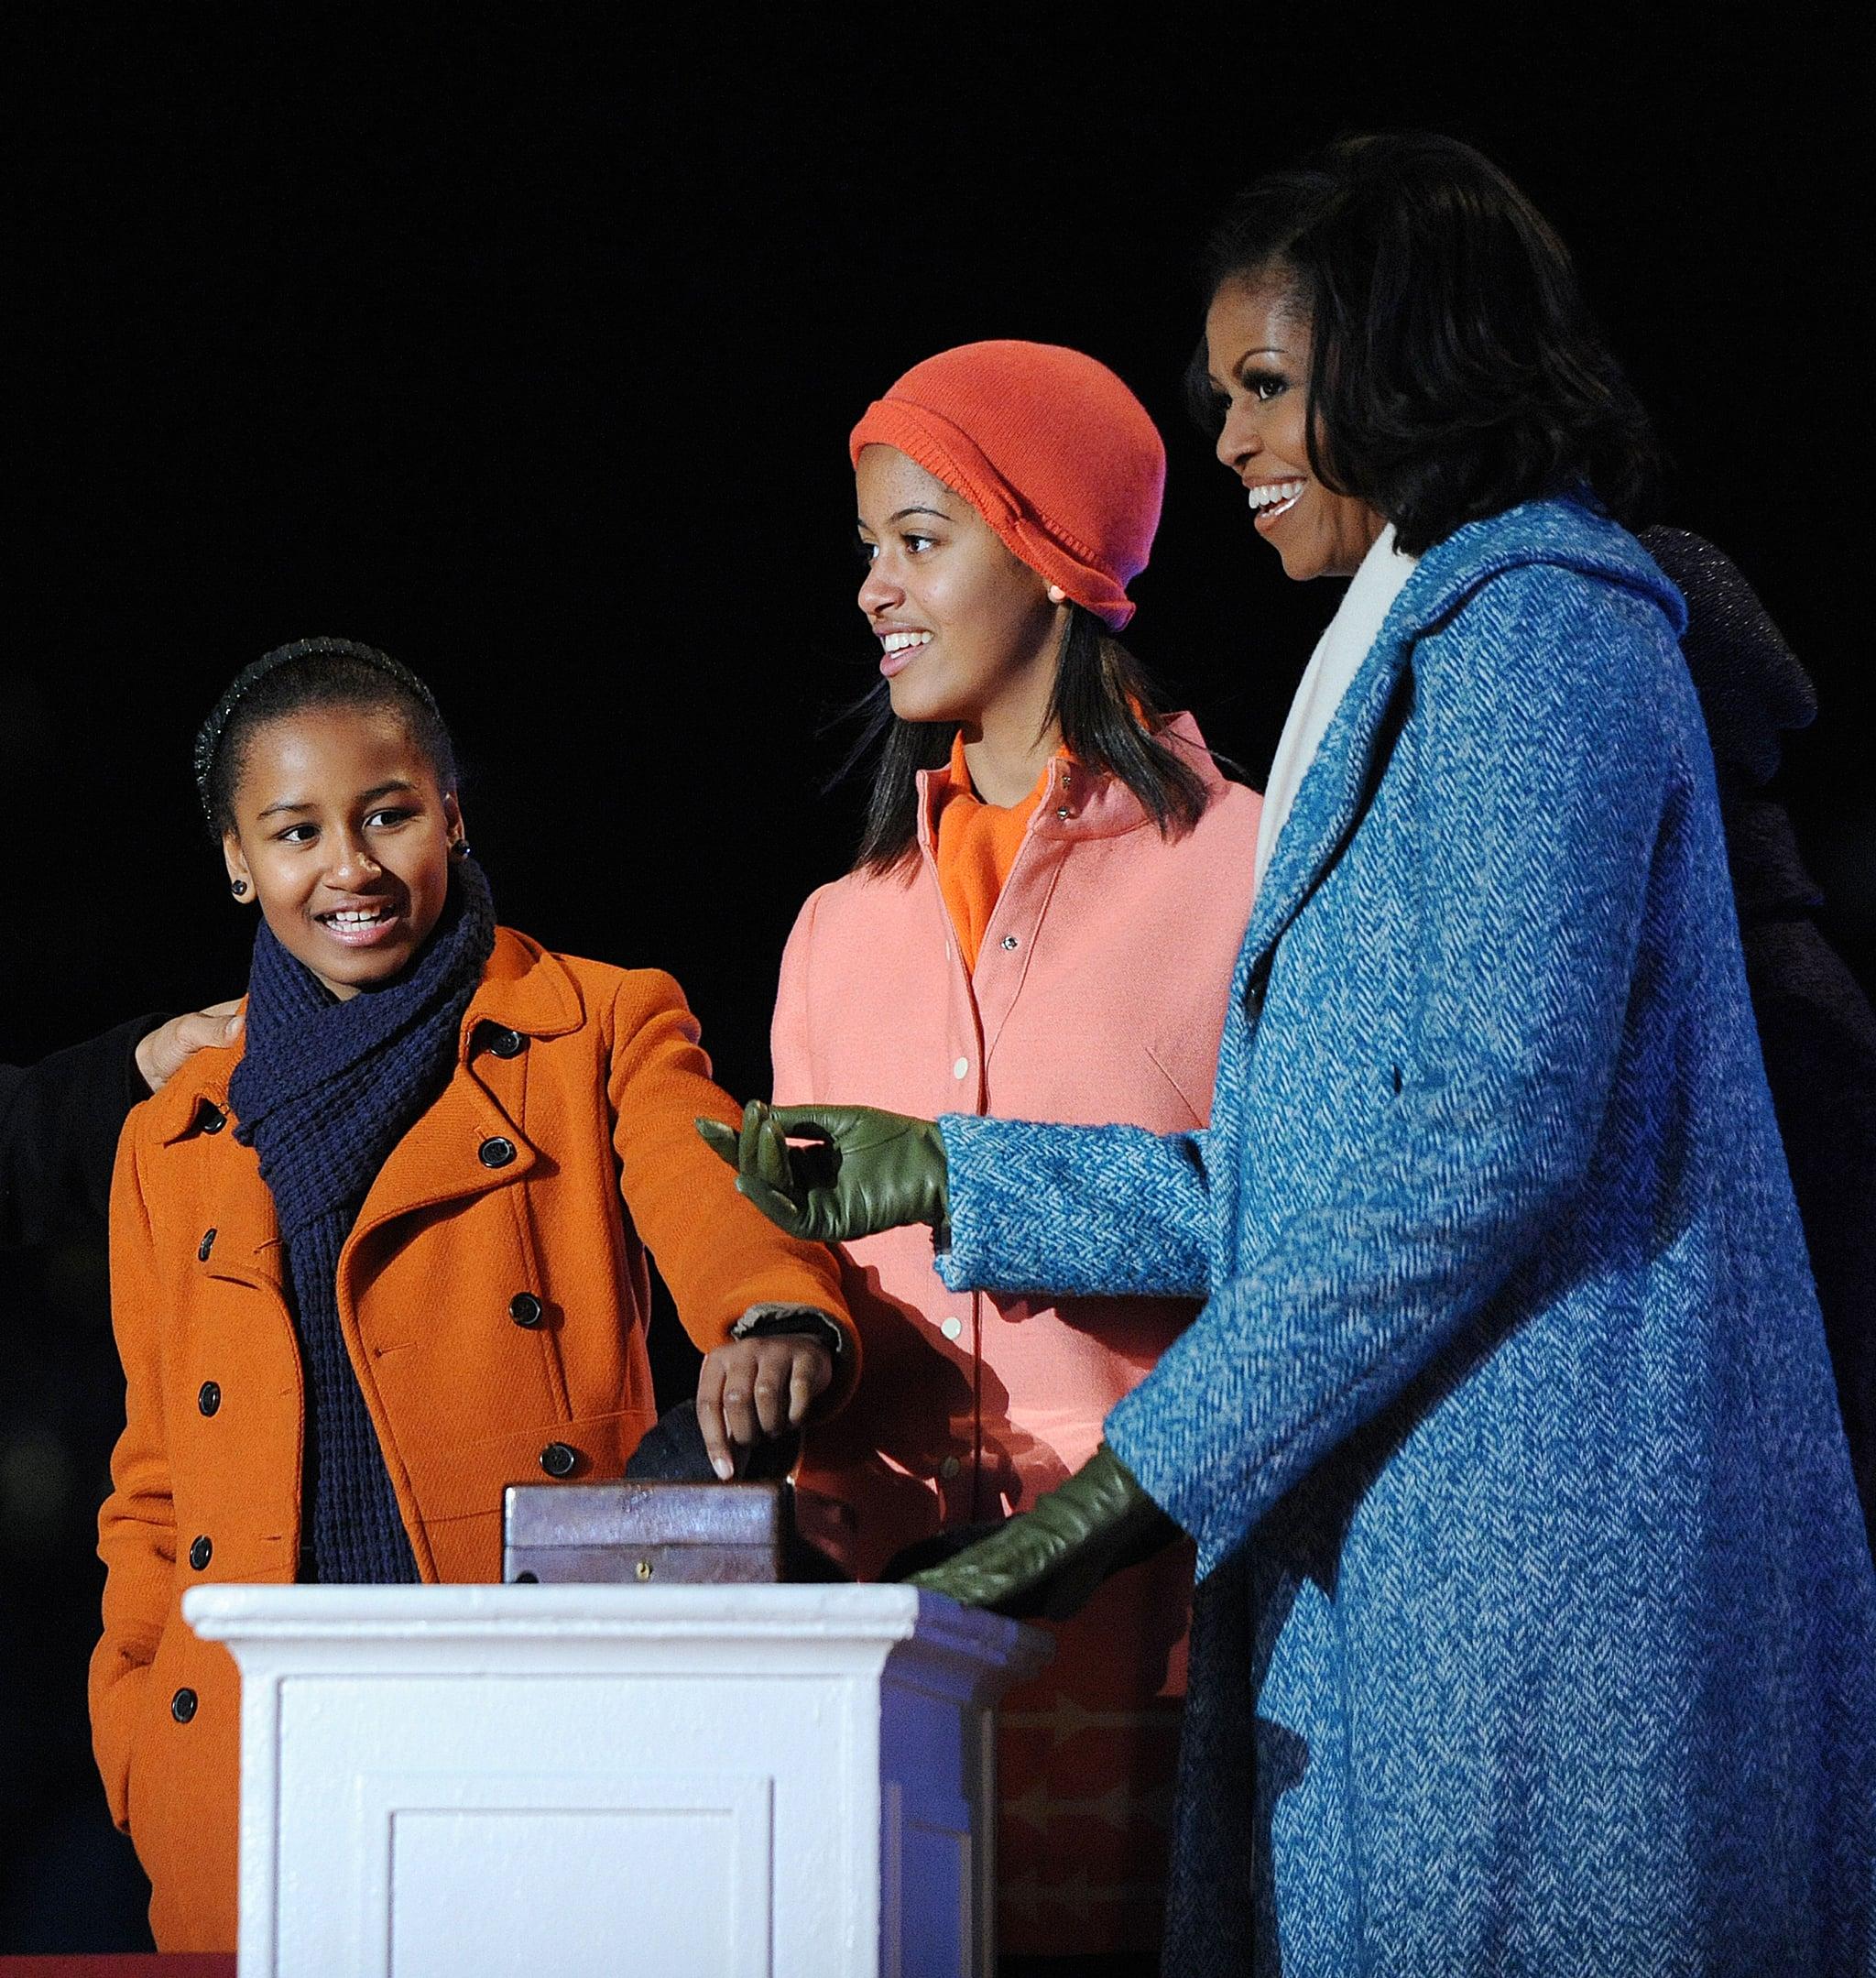 First Lady Michelle Obama With Malia and Sasha, 2012